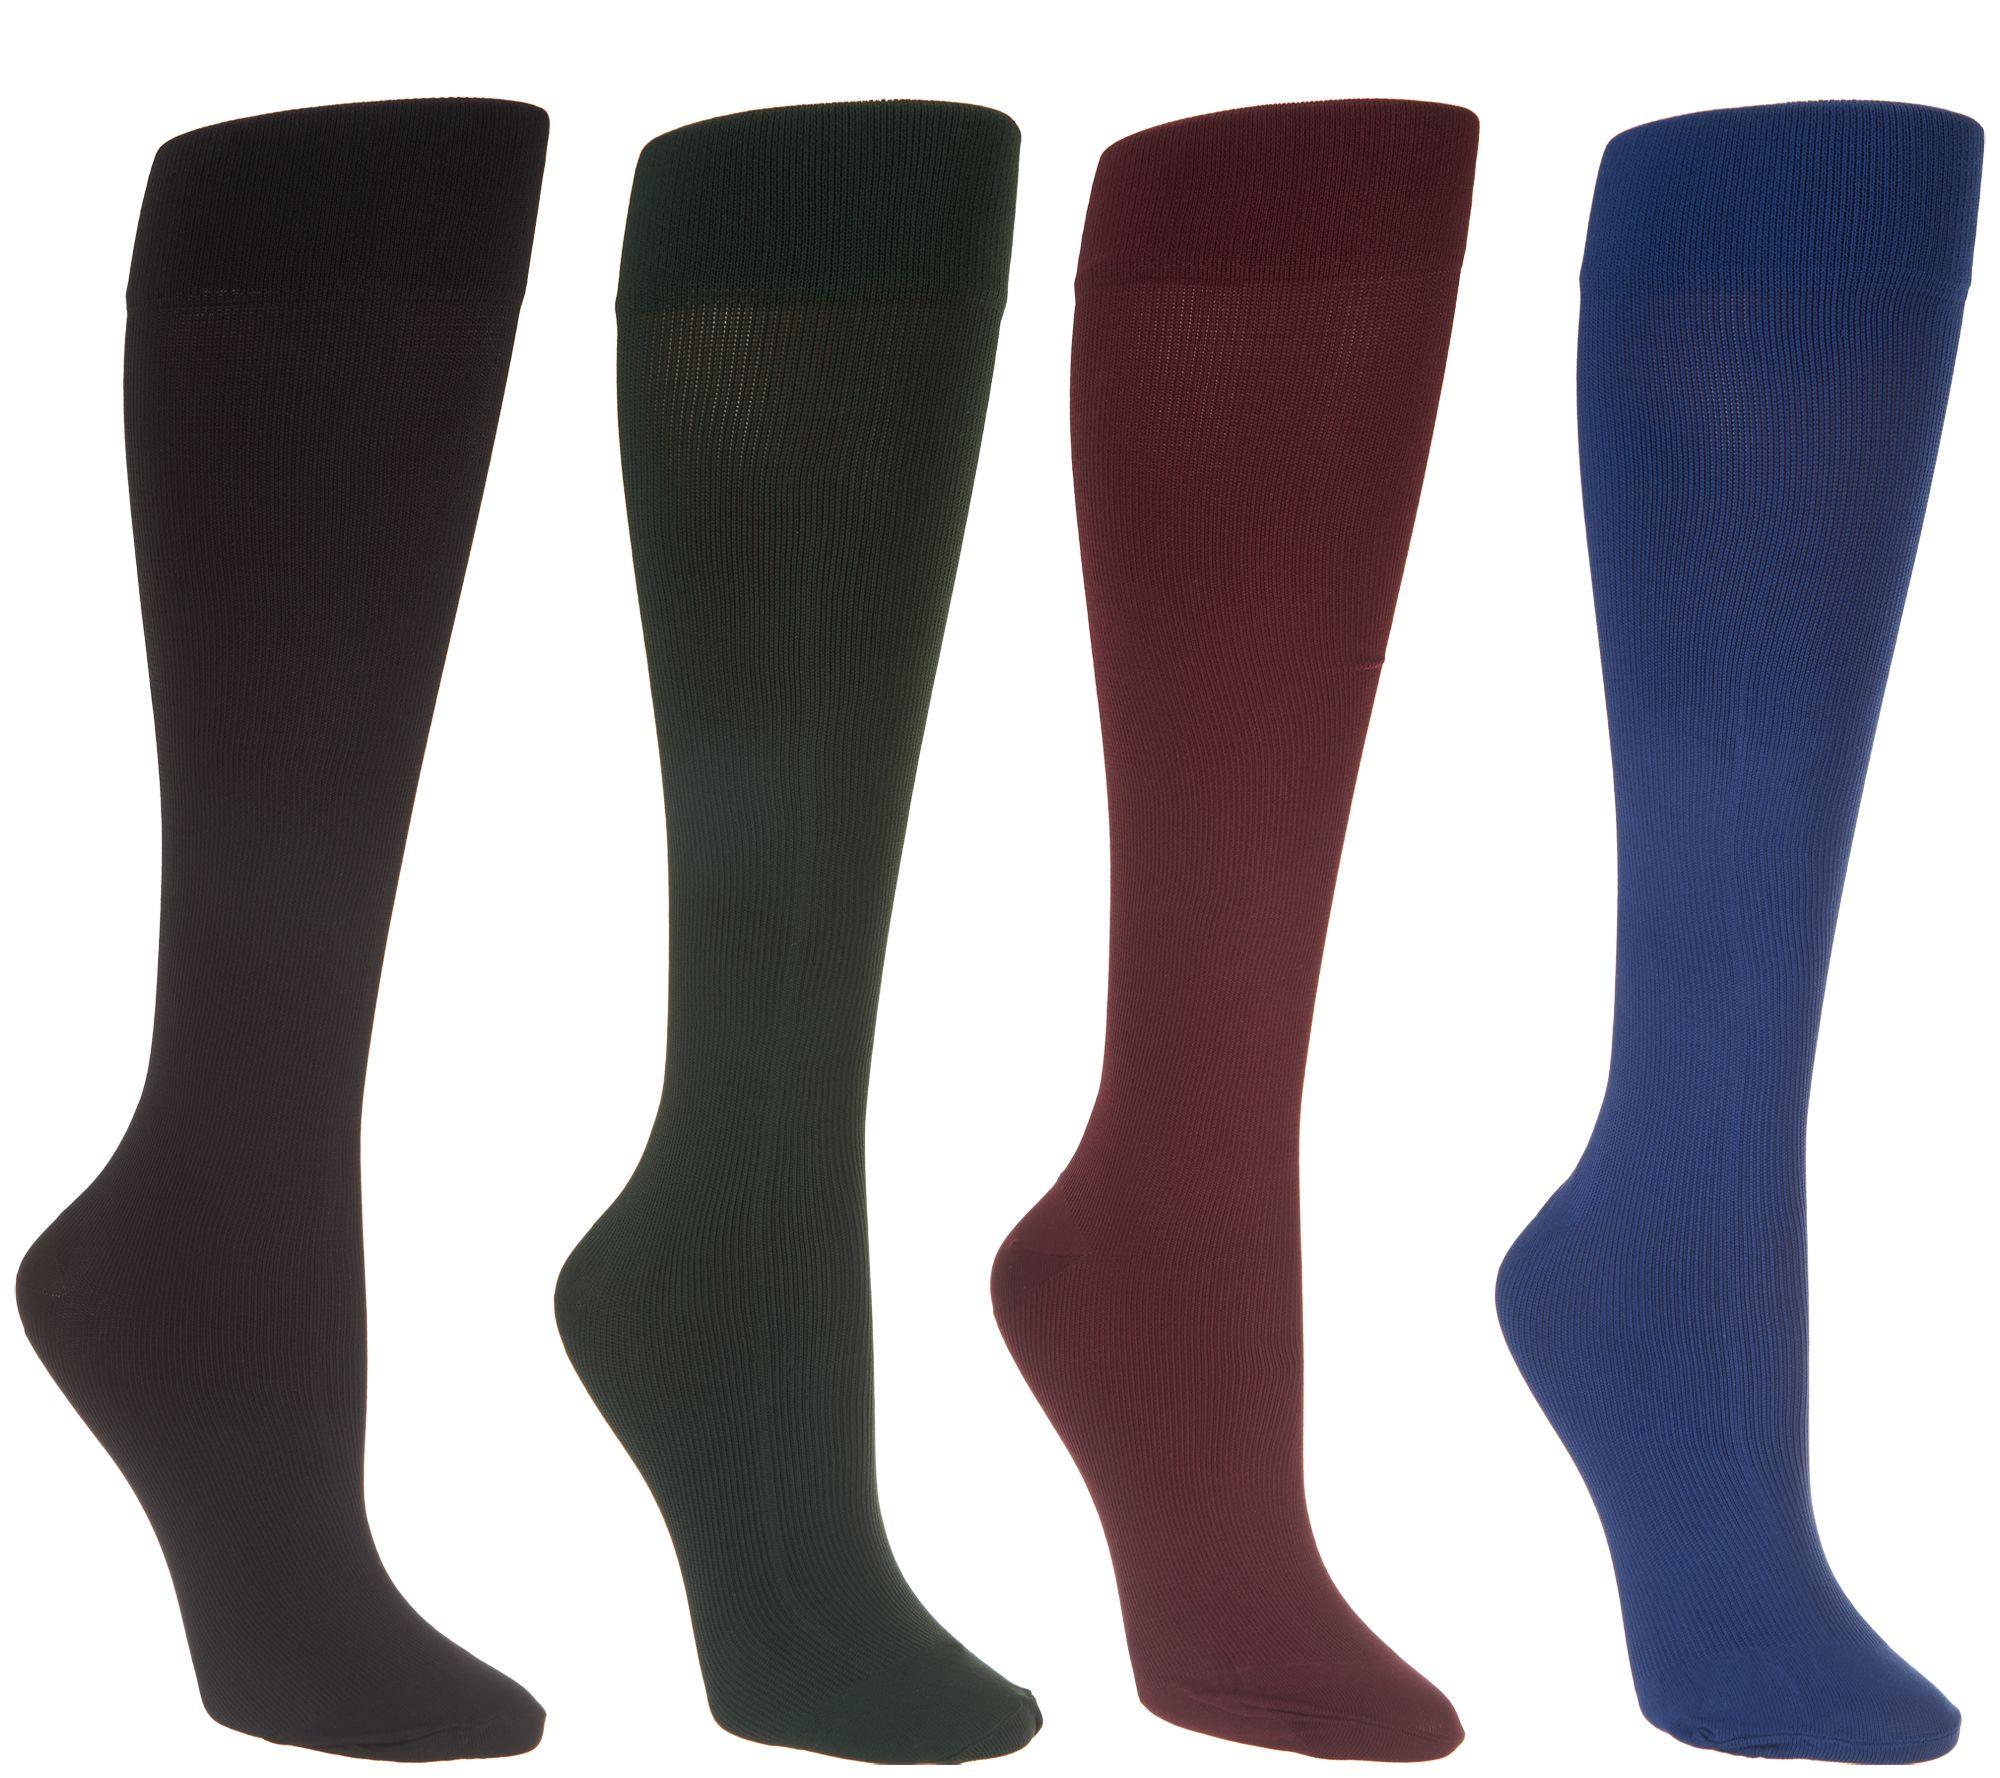 9df4556fdc5 Legacy Graduated Compression Socks 4 Pack - Page 1 — QVC.com